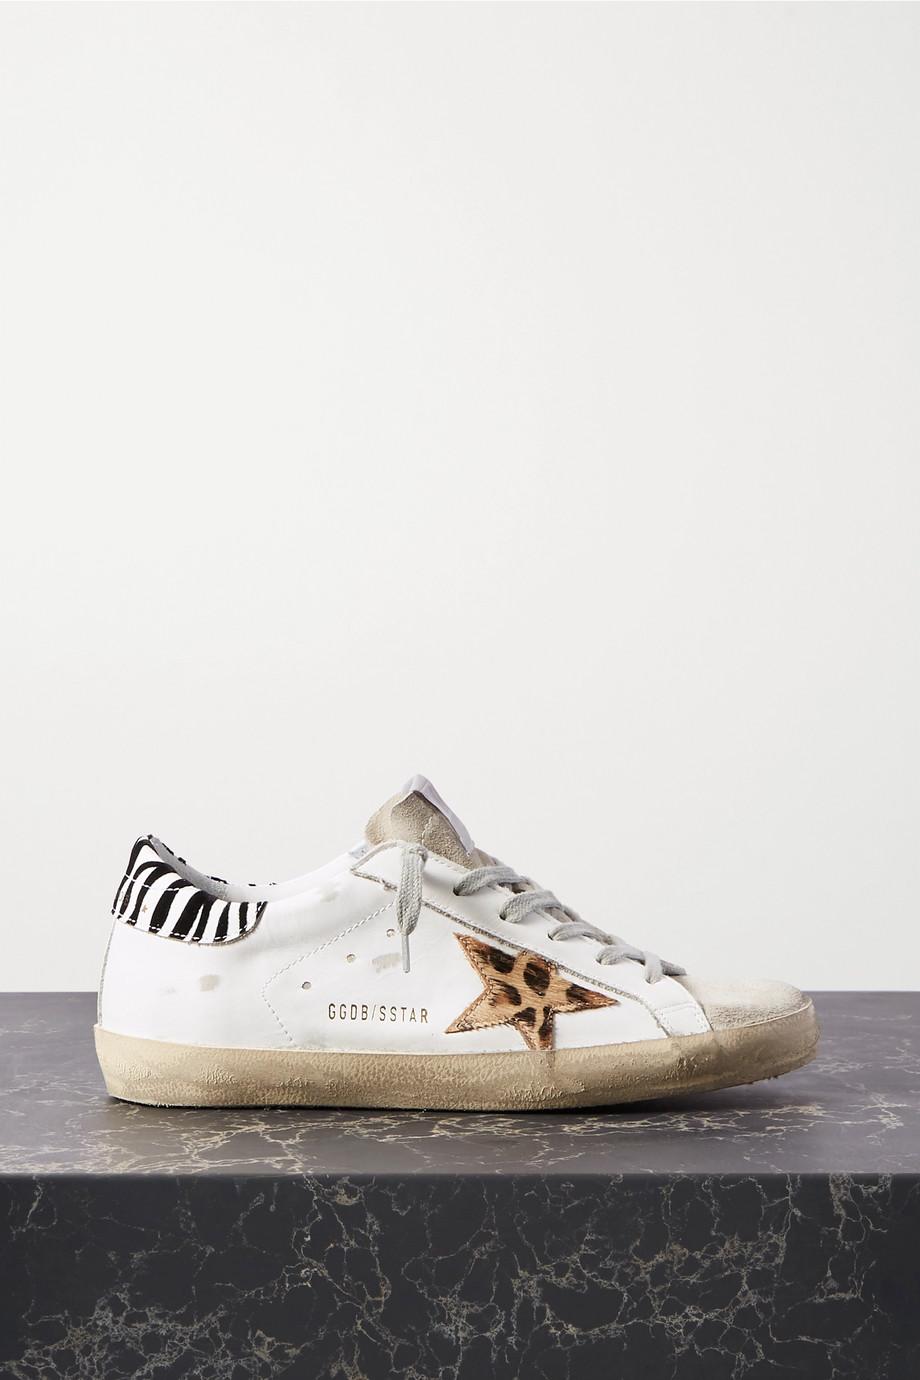 Golden Goose Superstar 仿旧豹纹小牛毛皮革绒面革运动鞋